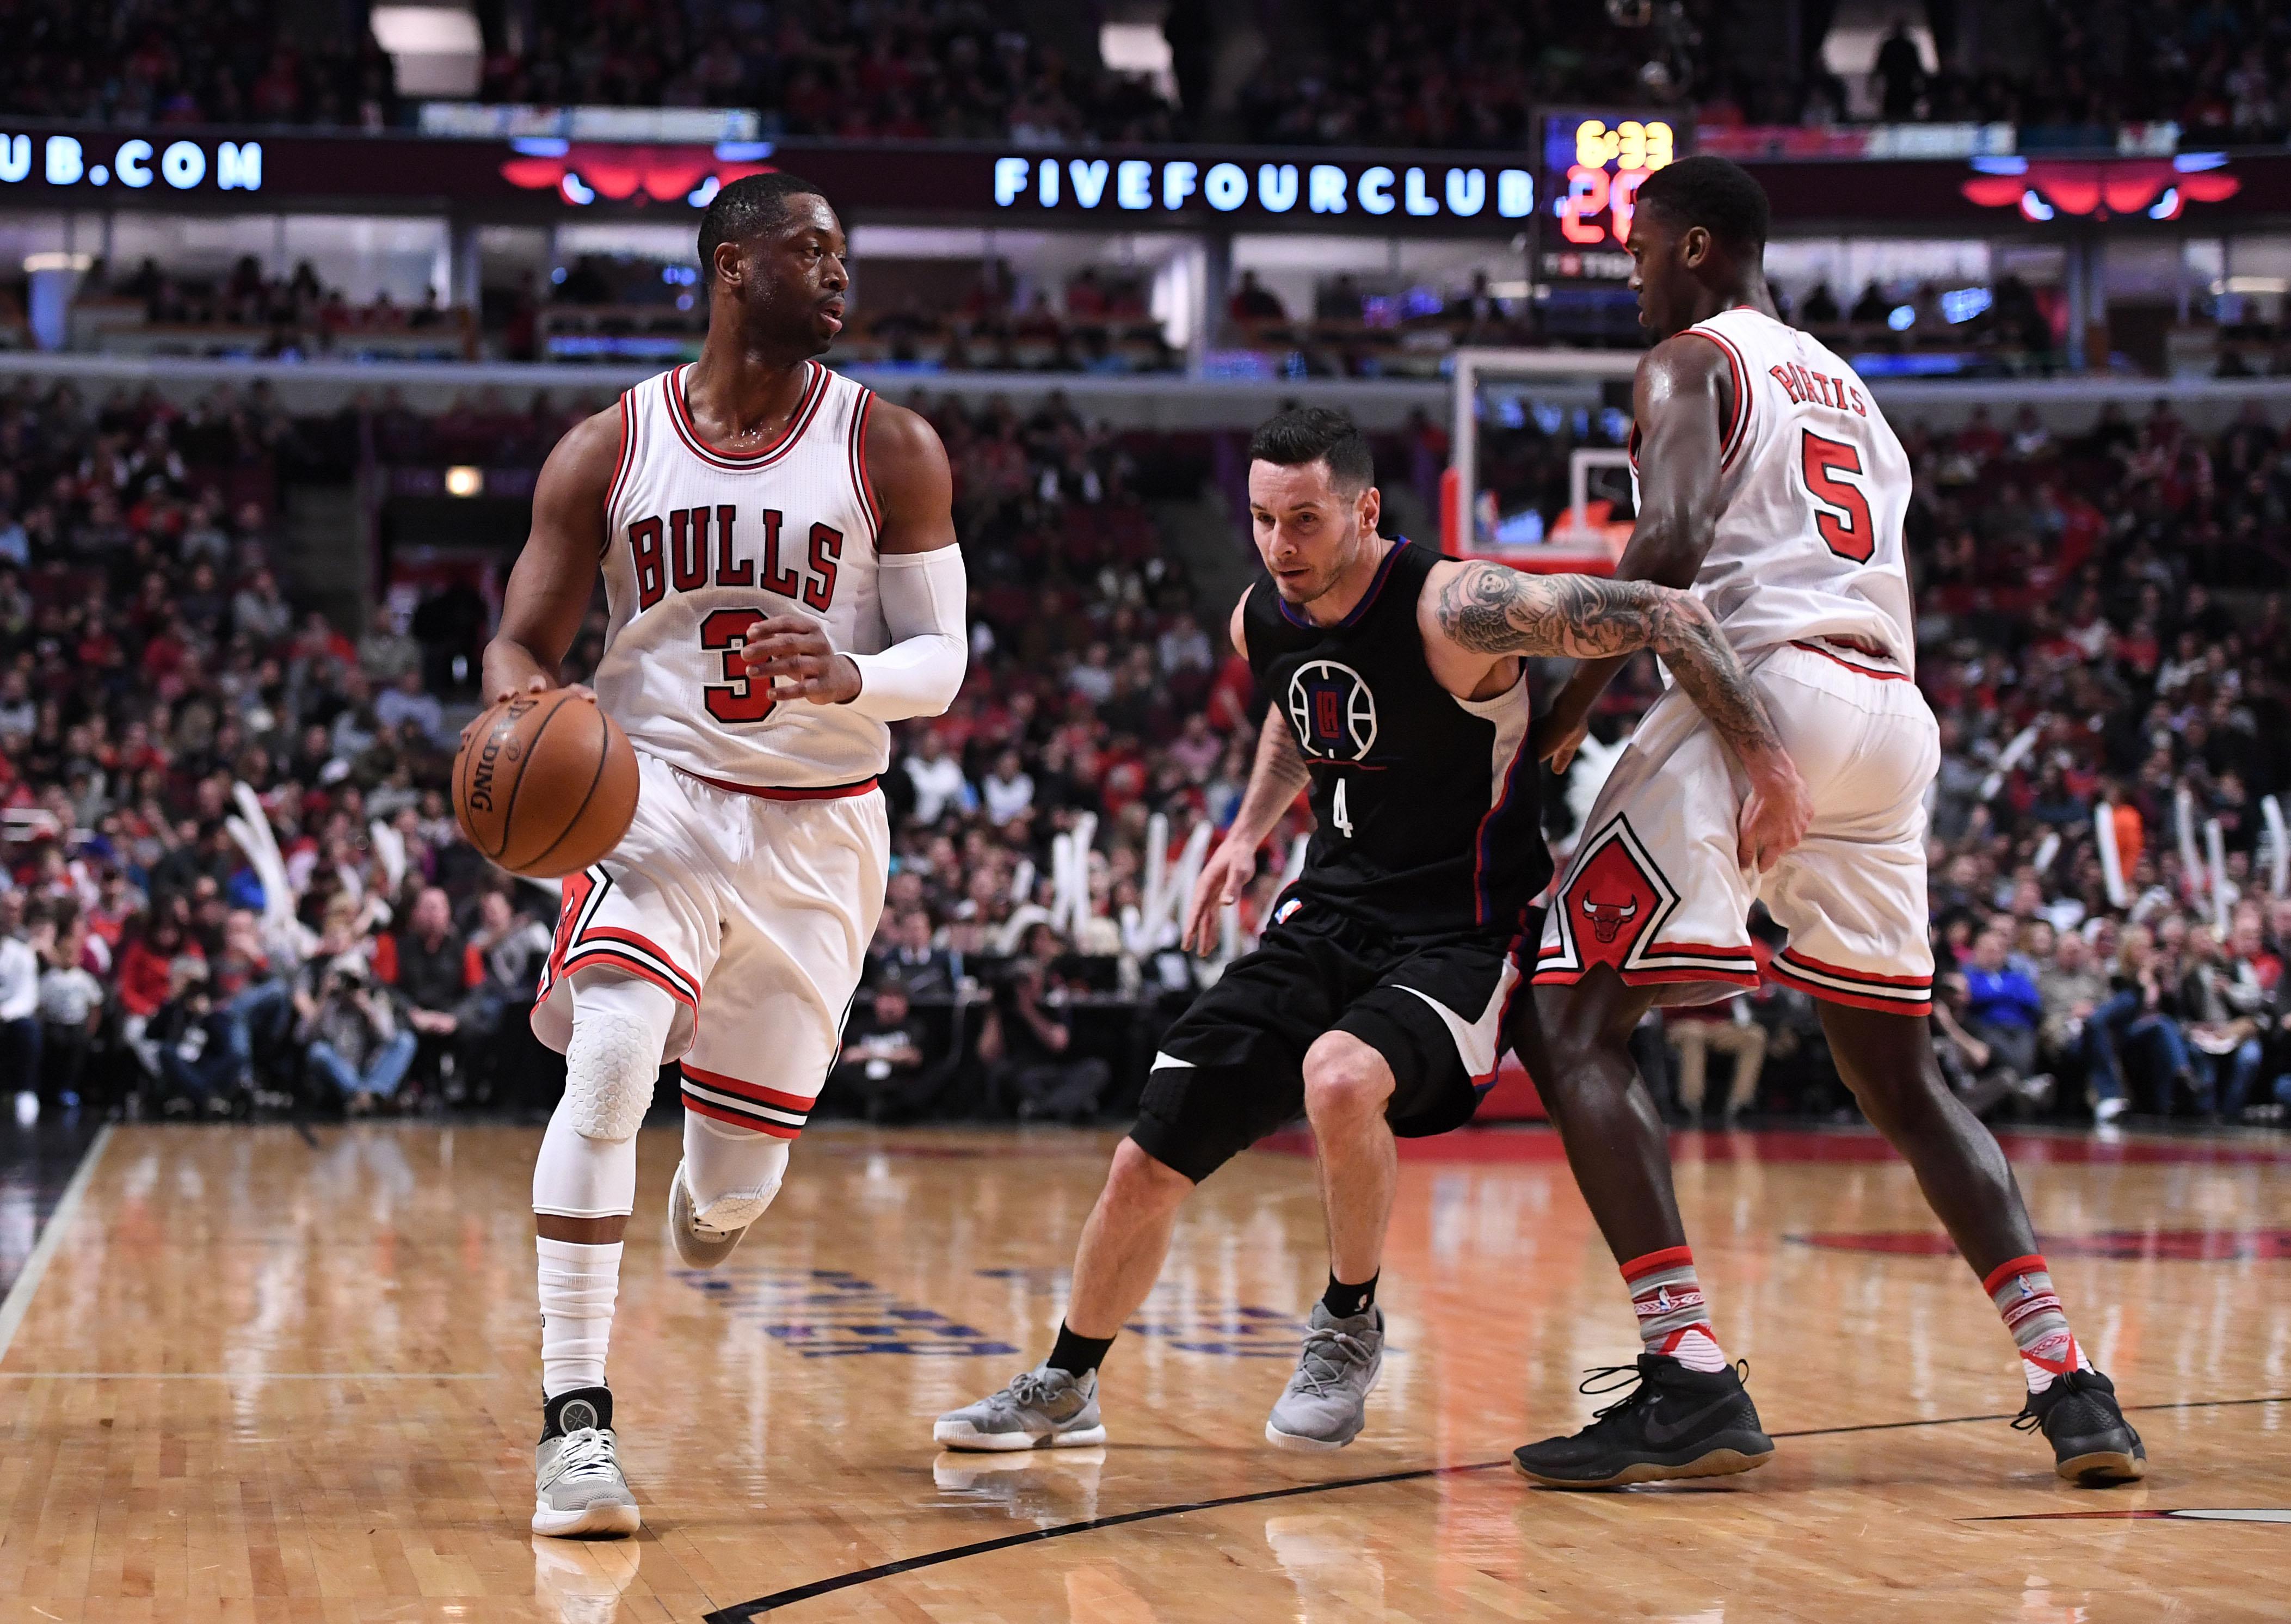 Clippers Vs Bulls Photo: Chicago Bulls Vs. Los Angeles Clippers: Poor Second Half